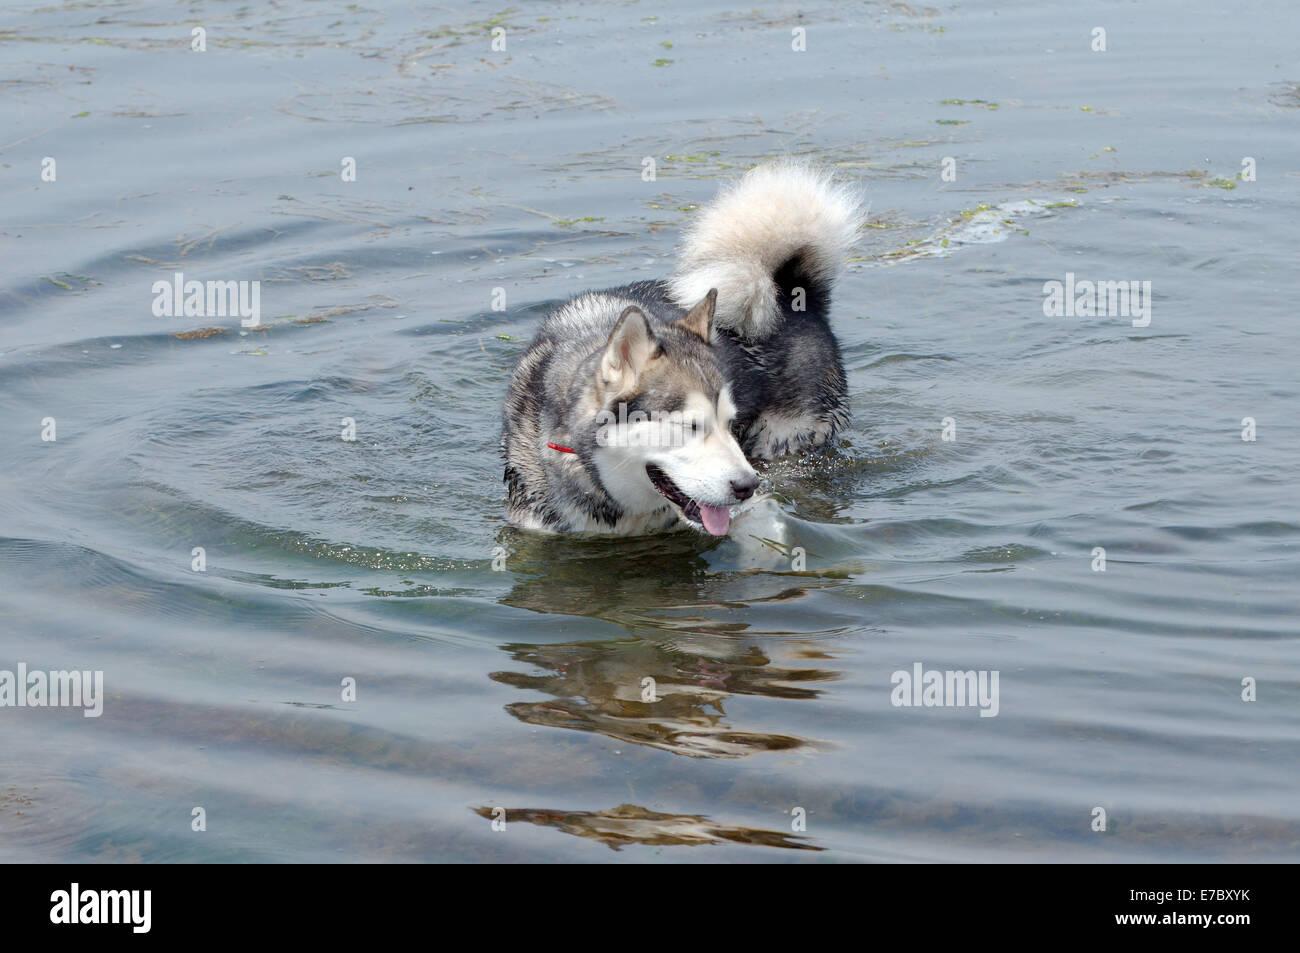 Alaskan Malamute (Canis lupus familiaris)  swims in the Sea of Japan, Vladivostok, Far East Russia - Stock Image